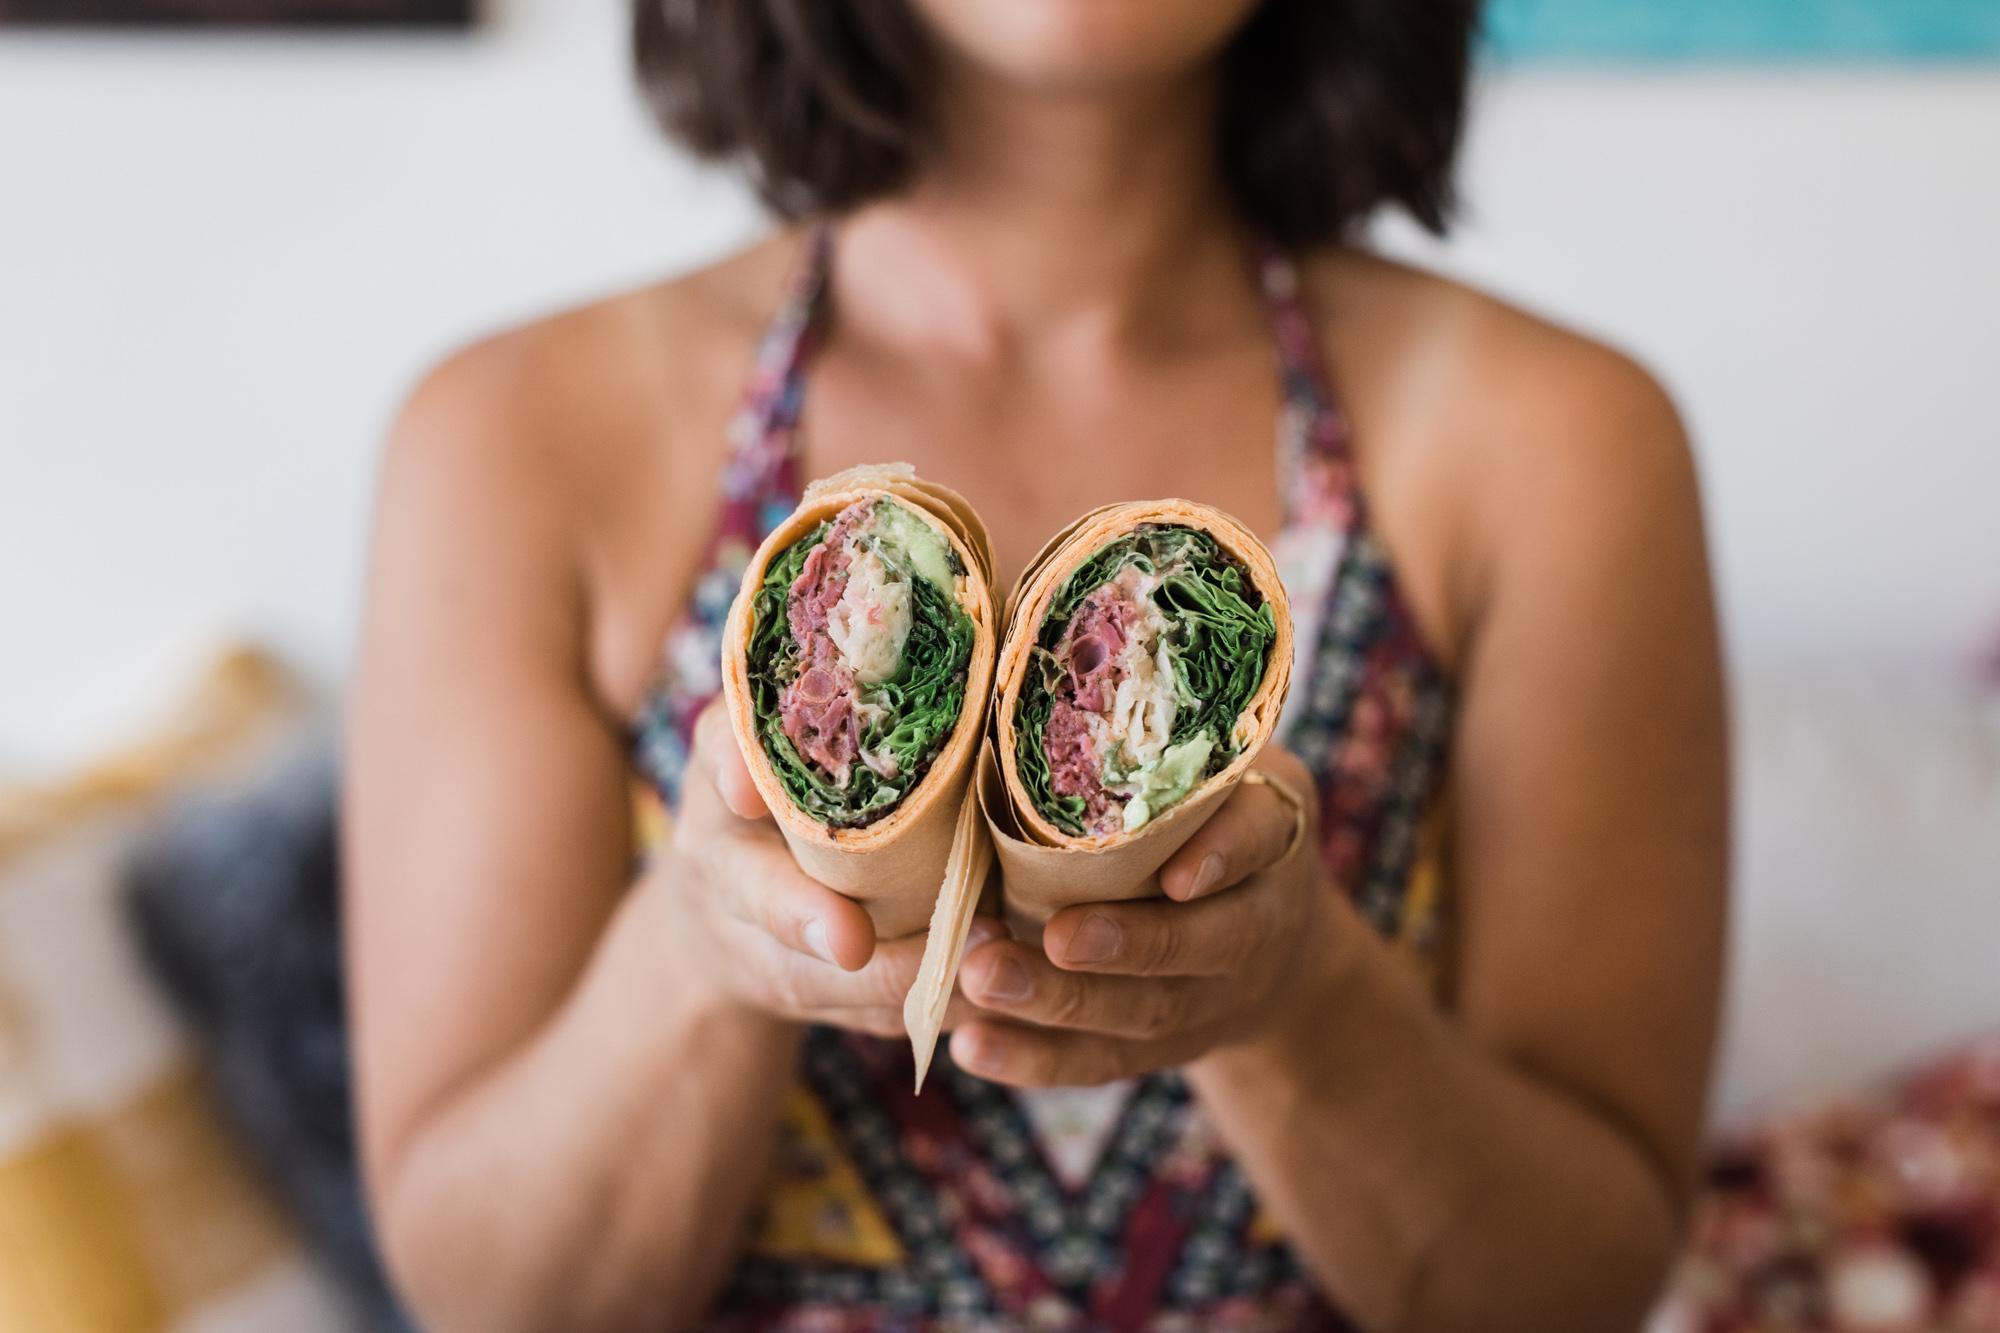 Healthy vegan wraps at That's A Wrap Cafe, Kihei, Maui